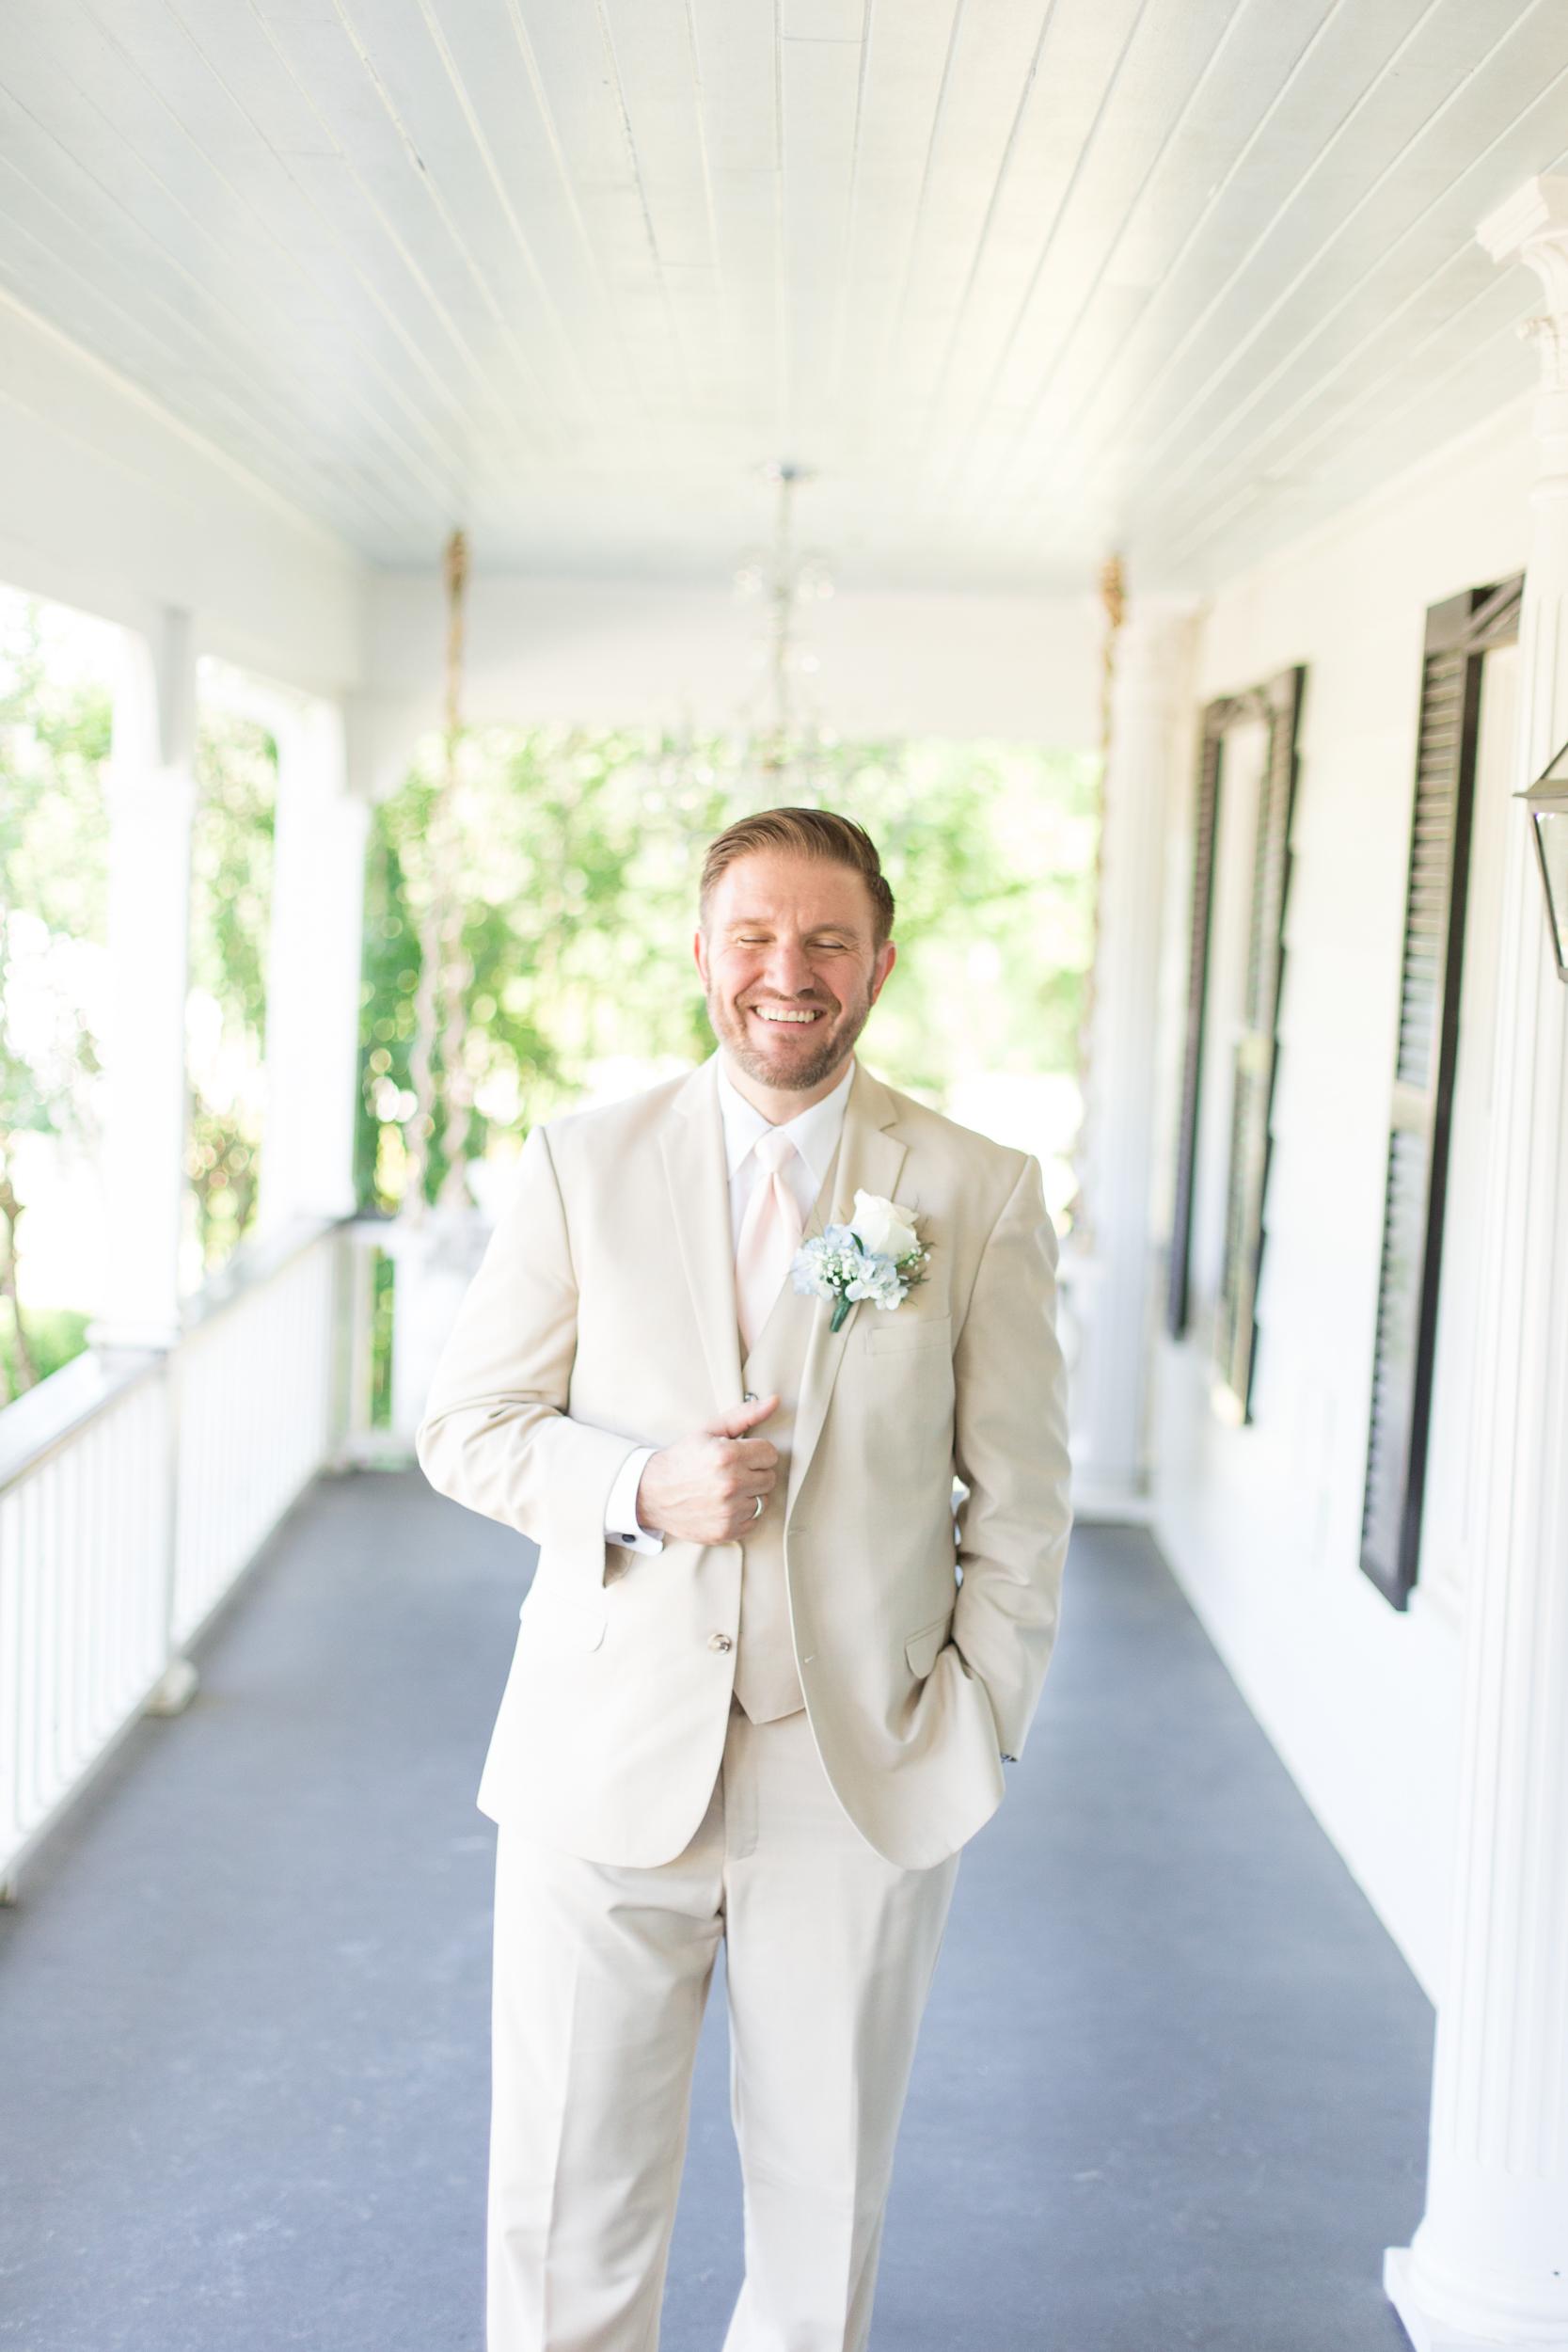 Zihlman-East TX Wedding_Kelsie Hendricks Photography_The Folmar Tyler Texas-85.jpg